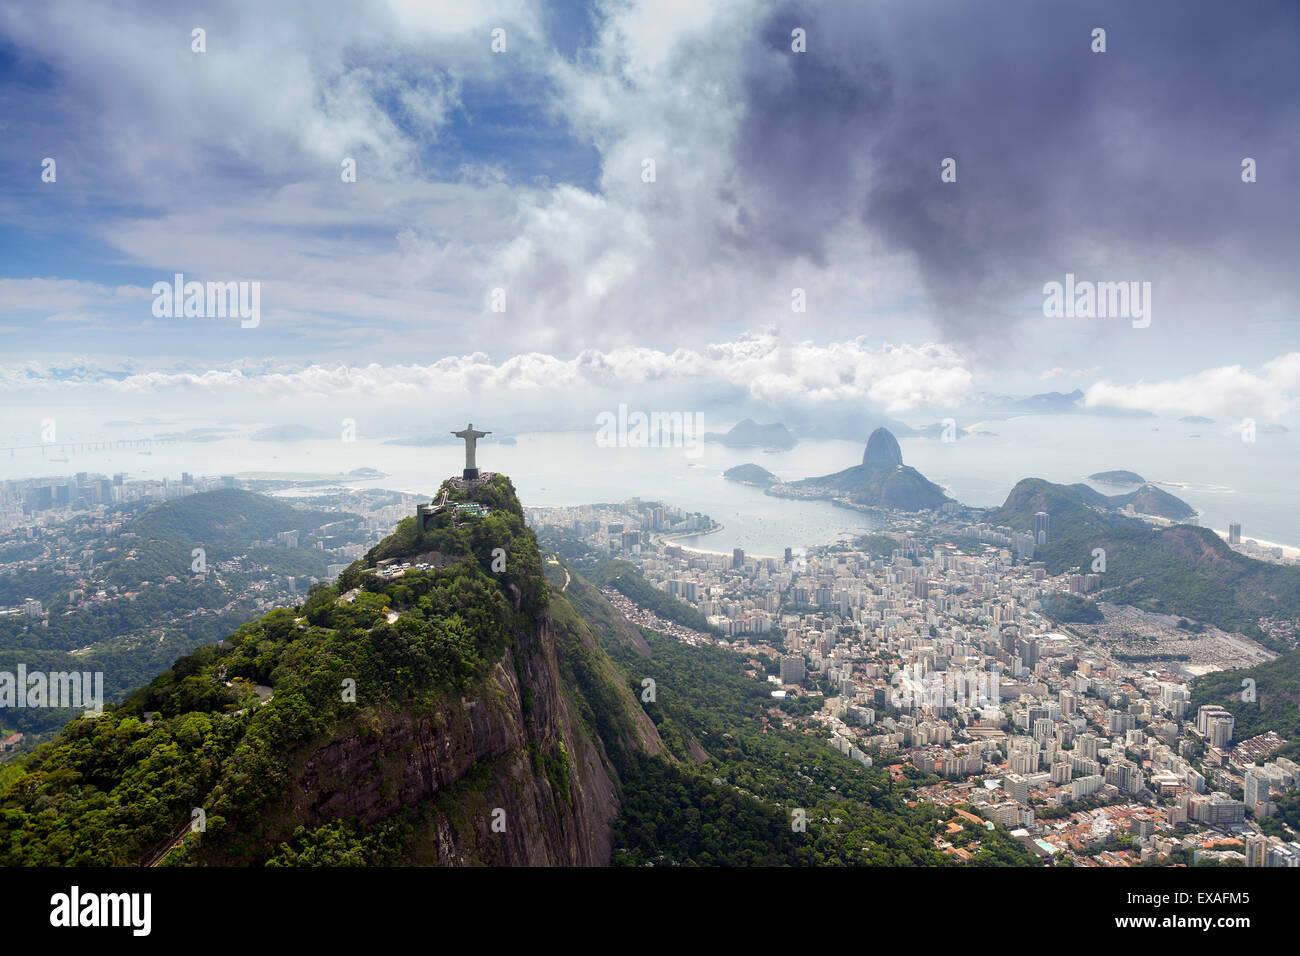 Rio de Janeiro landscape showing Corcovado, the Christ and the Sugar Loaf, UNESCO Site, Rio de Janeiro, Brazil, - Stock Image